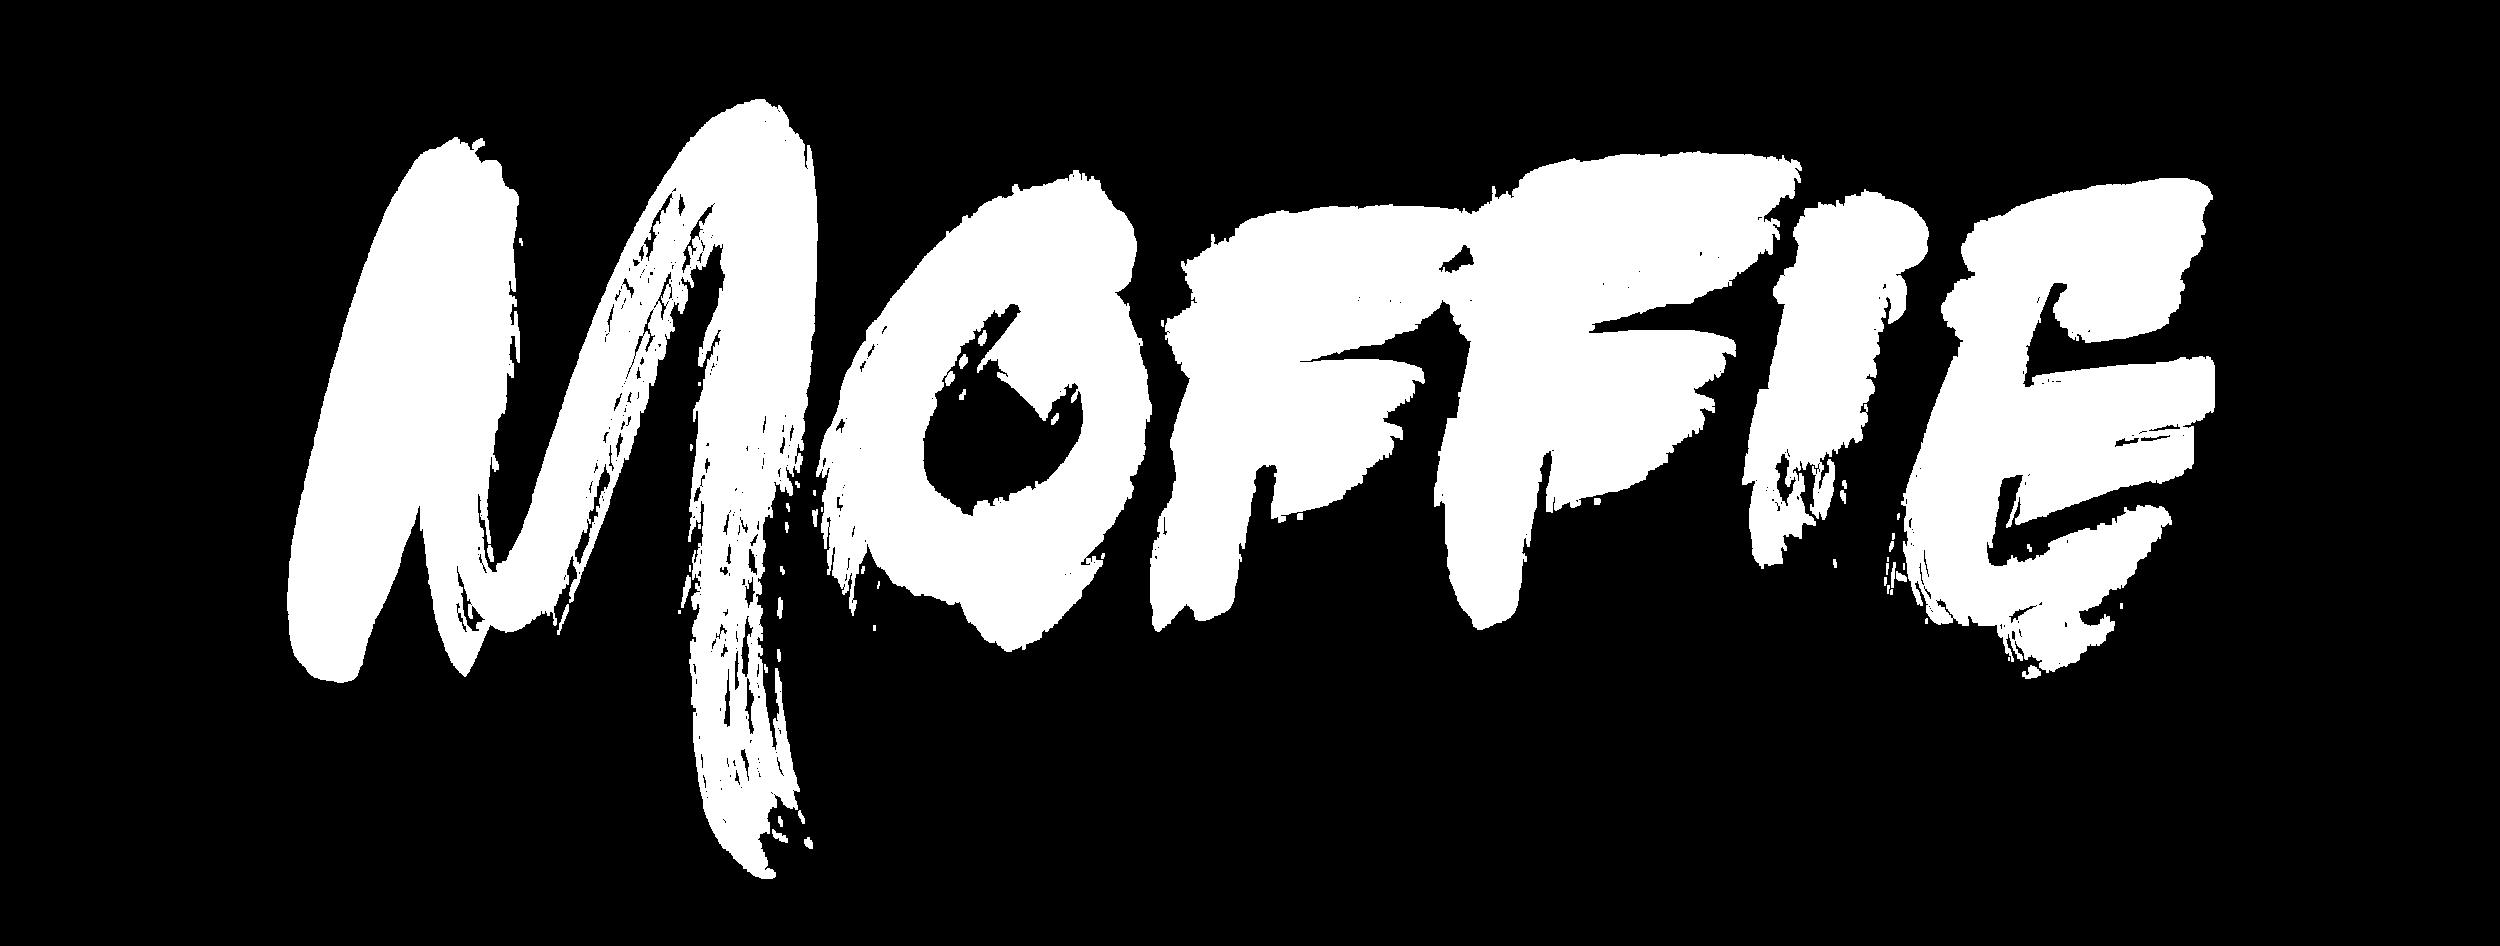 moffie_titles_alpha_300dpi.png